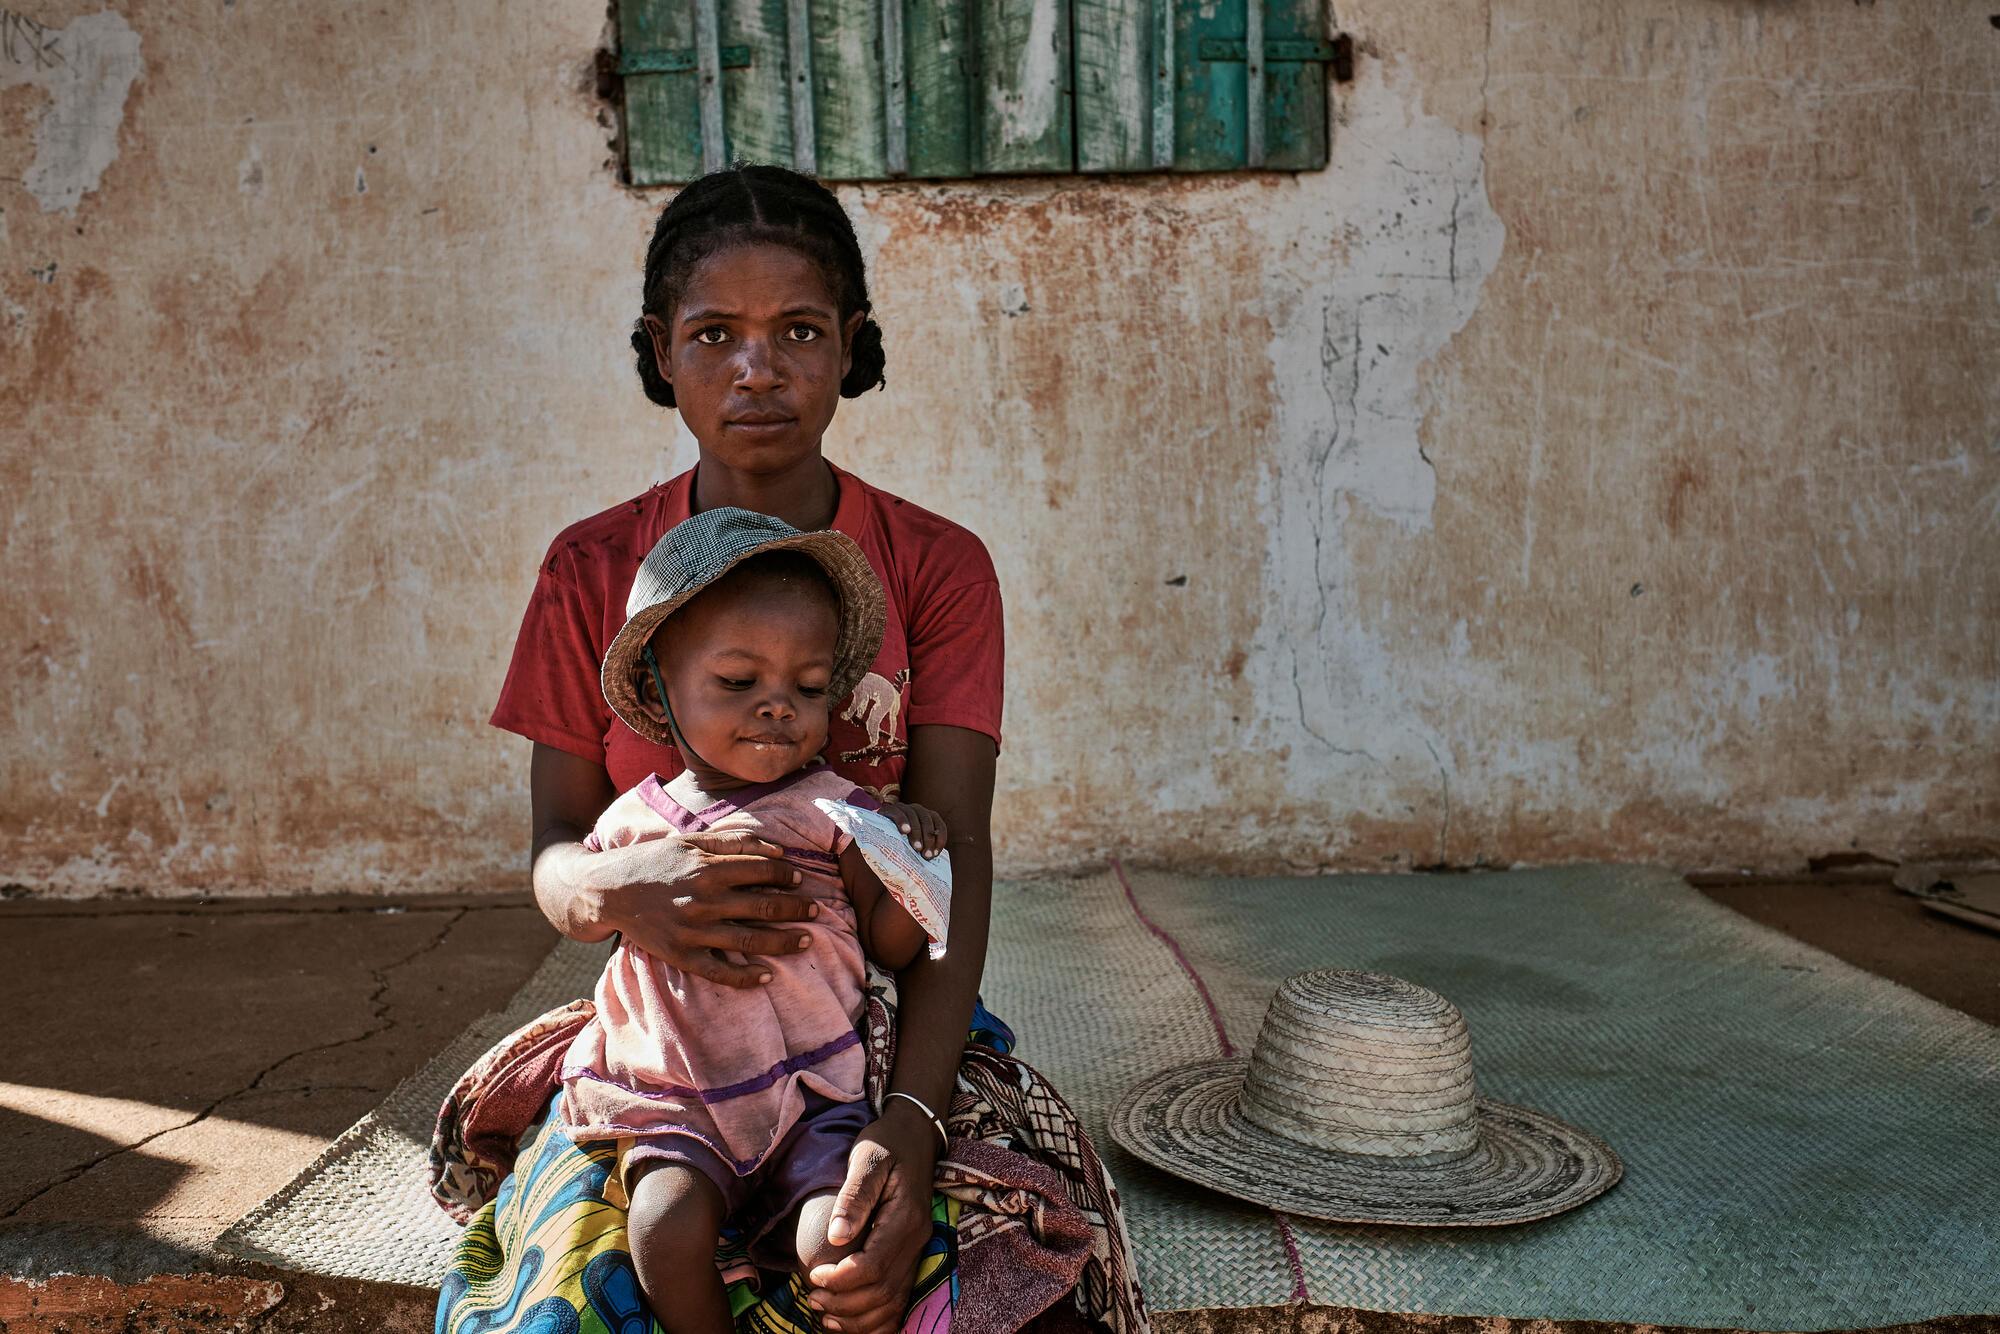 Photostory: Madagascar's looming famine